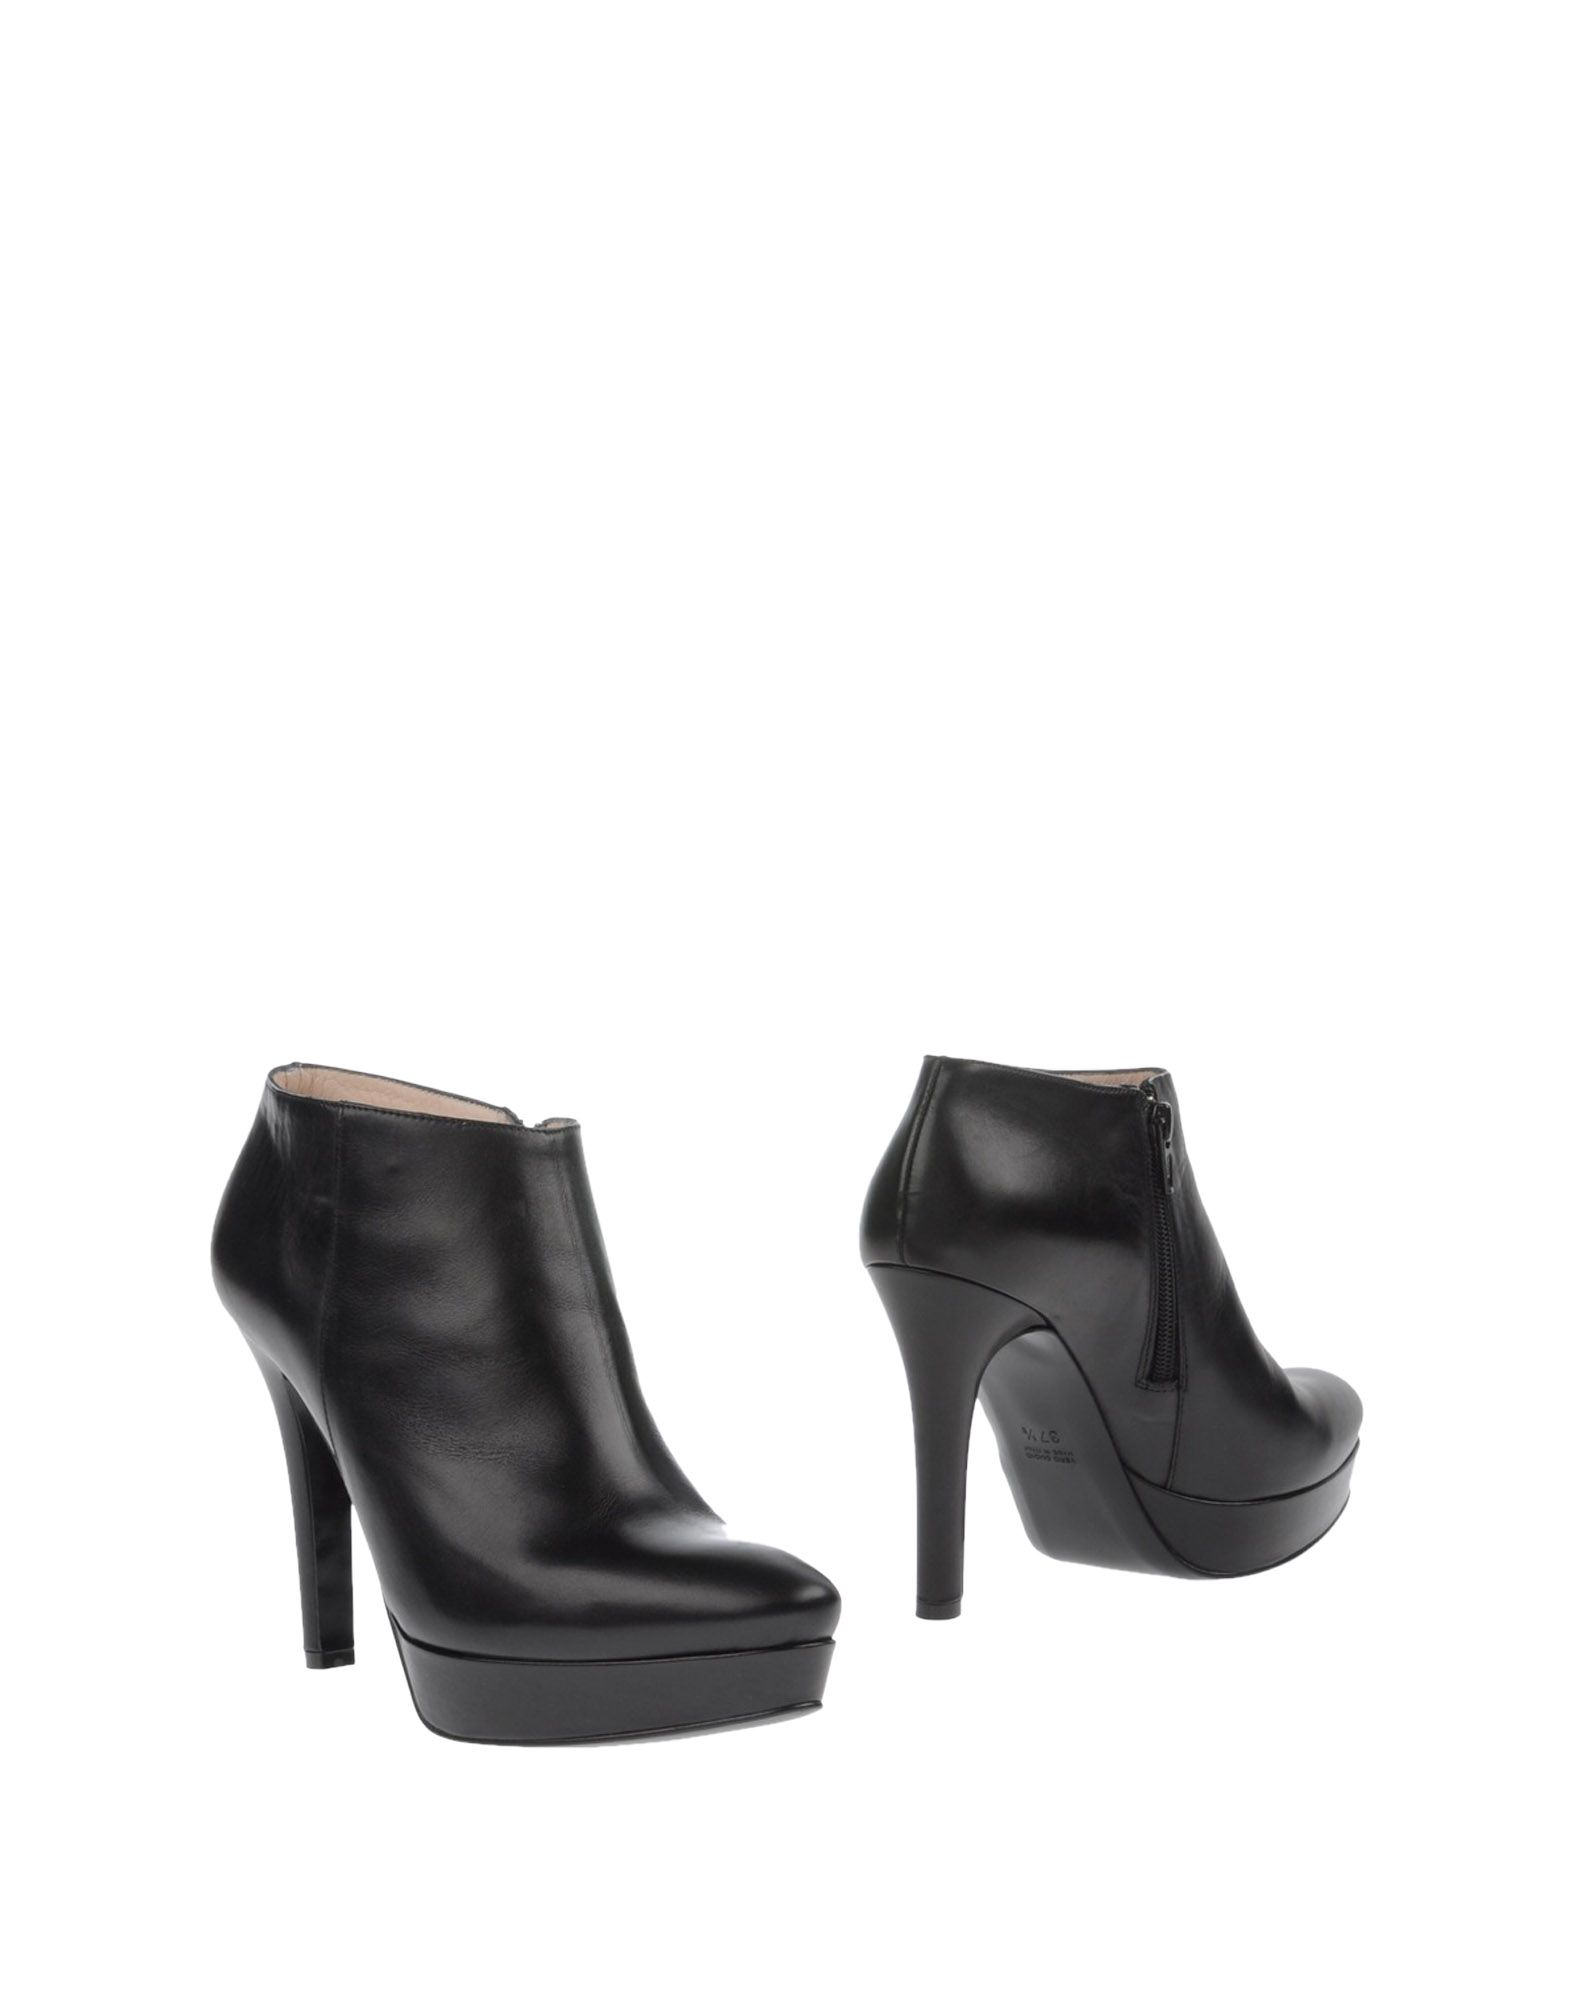 GUGLIELMO ROTTA Ботинки ботинки guglielmo rotta ботинки с высоким берцем page 7